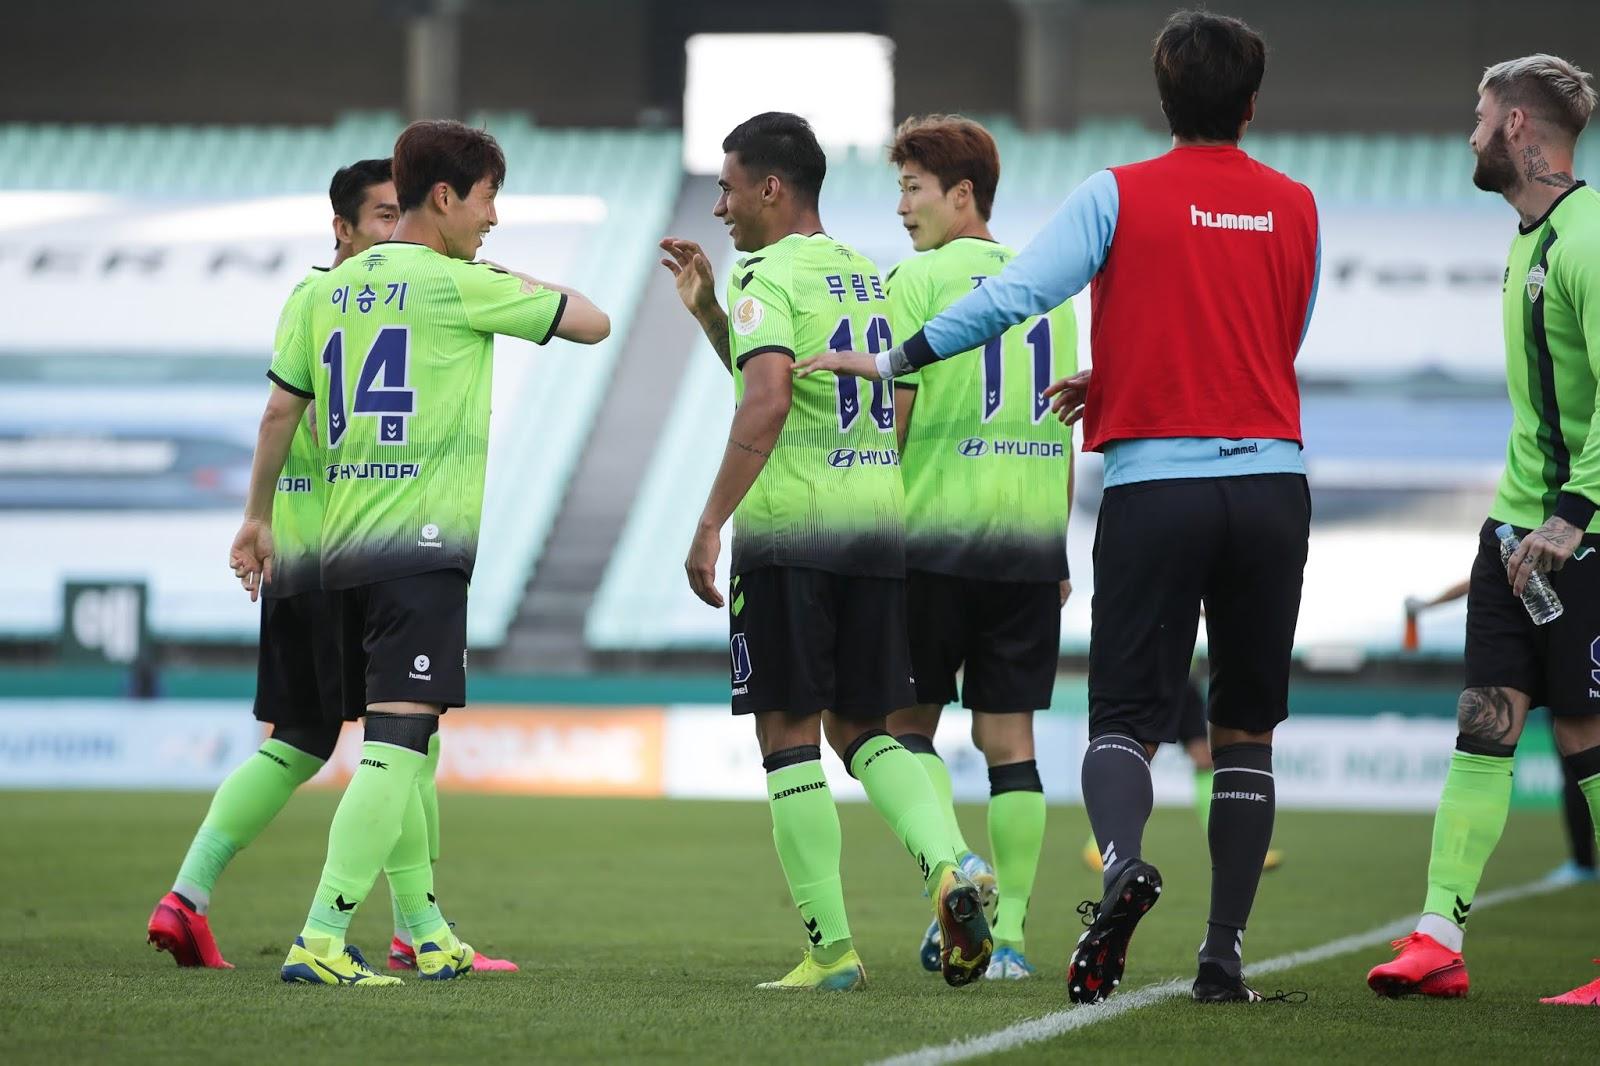 K League 1 Preview: Jeonbuk Hyundai Motors vs Incheon United